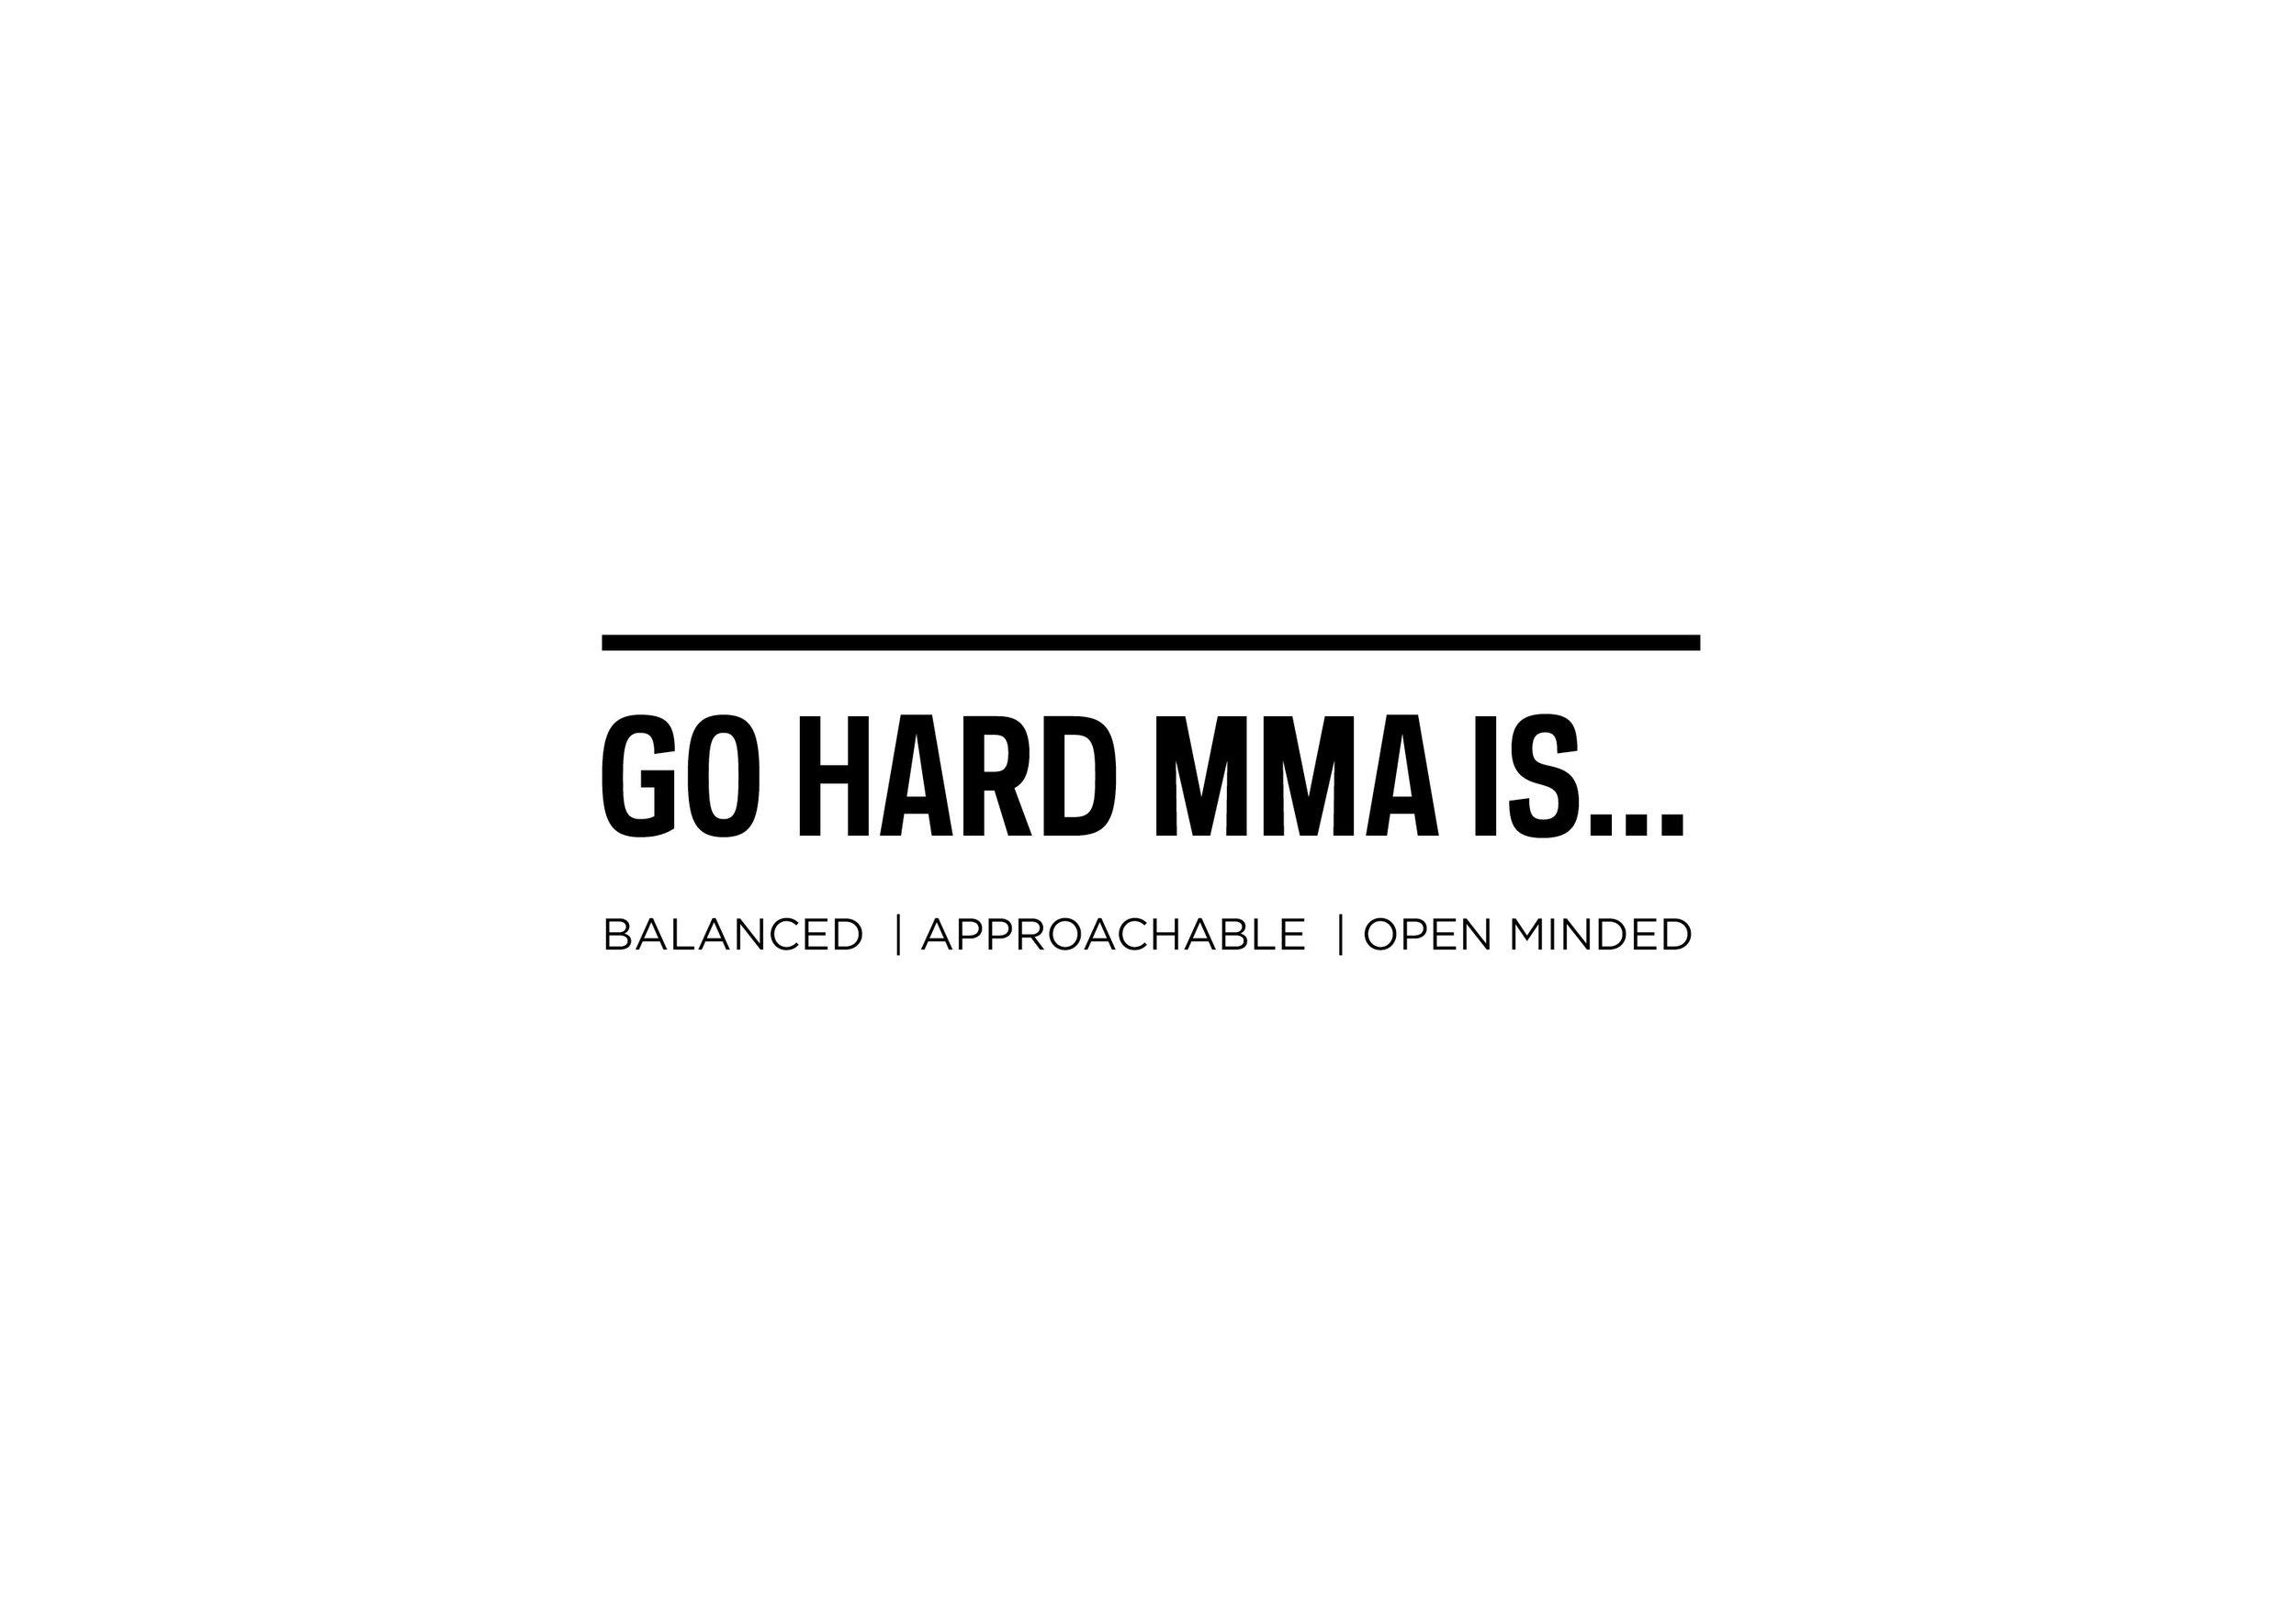 GO HARD MMA deliverables2.jpg